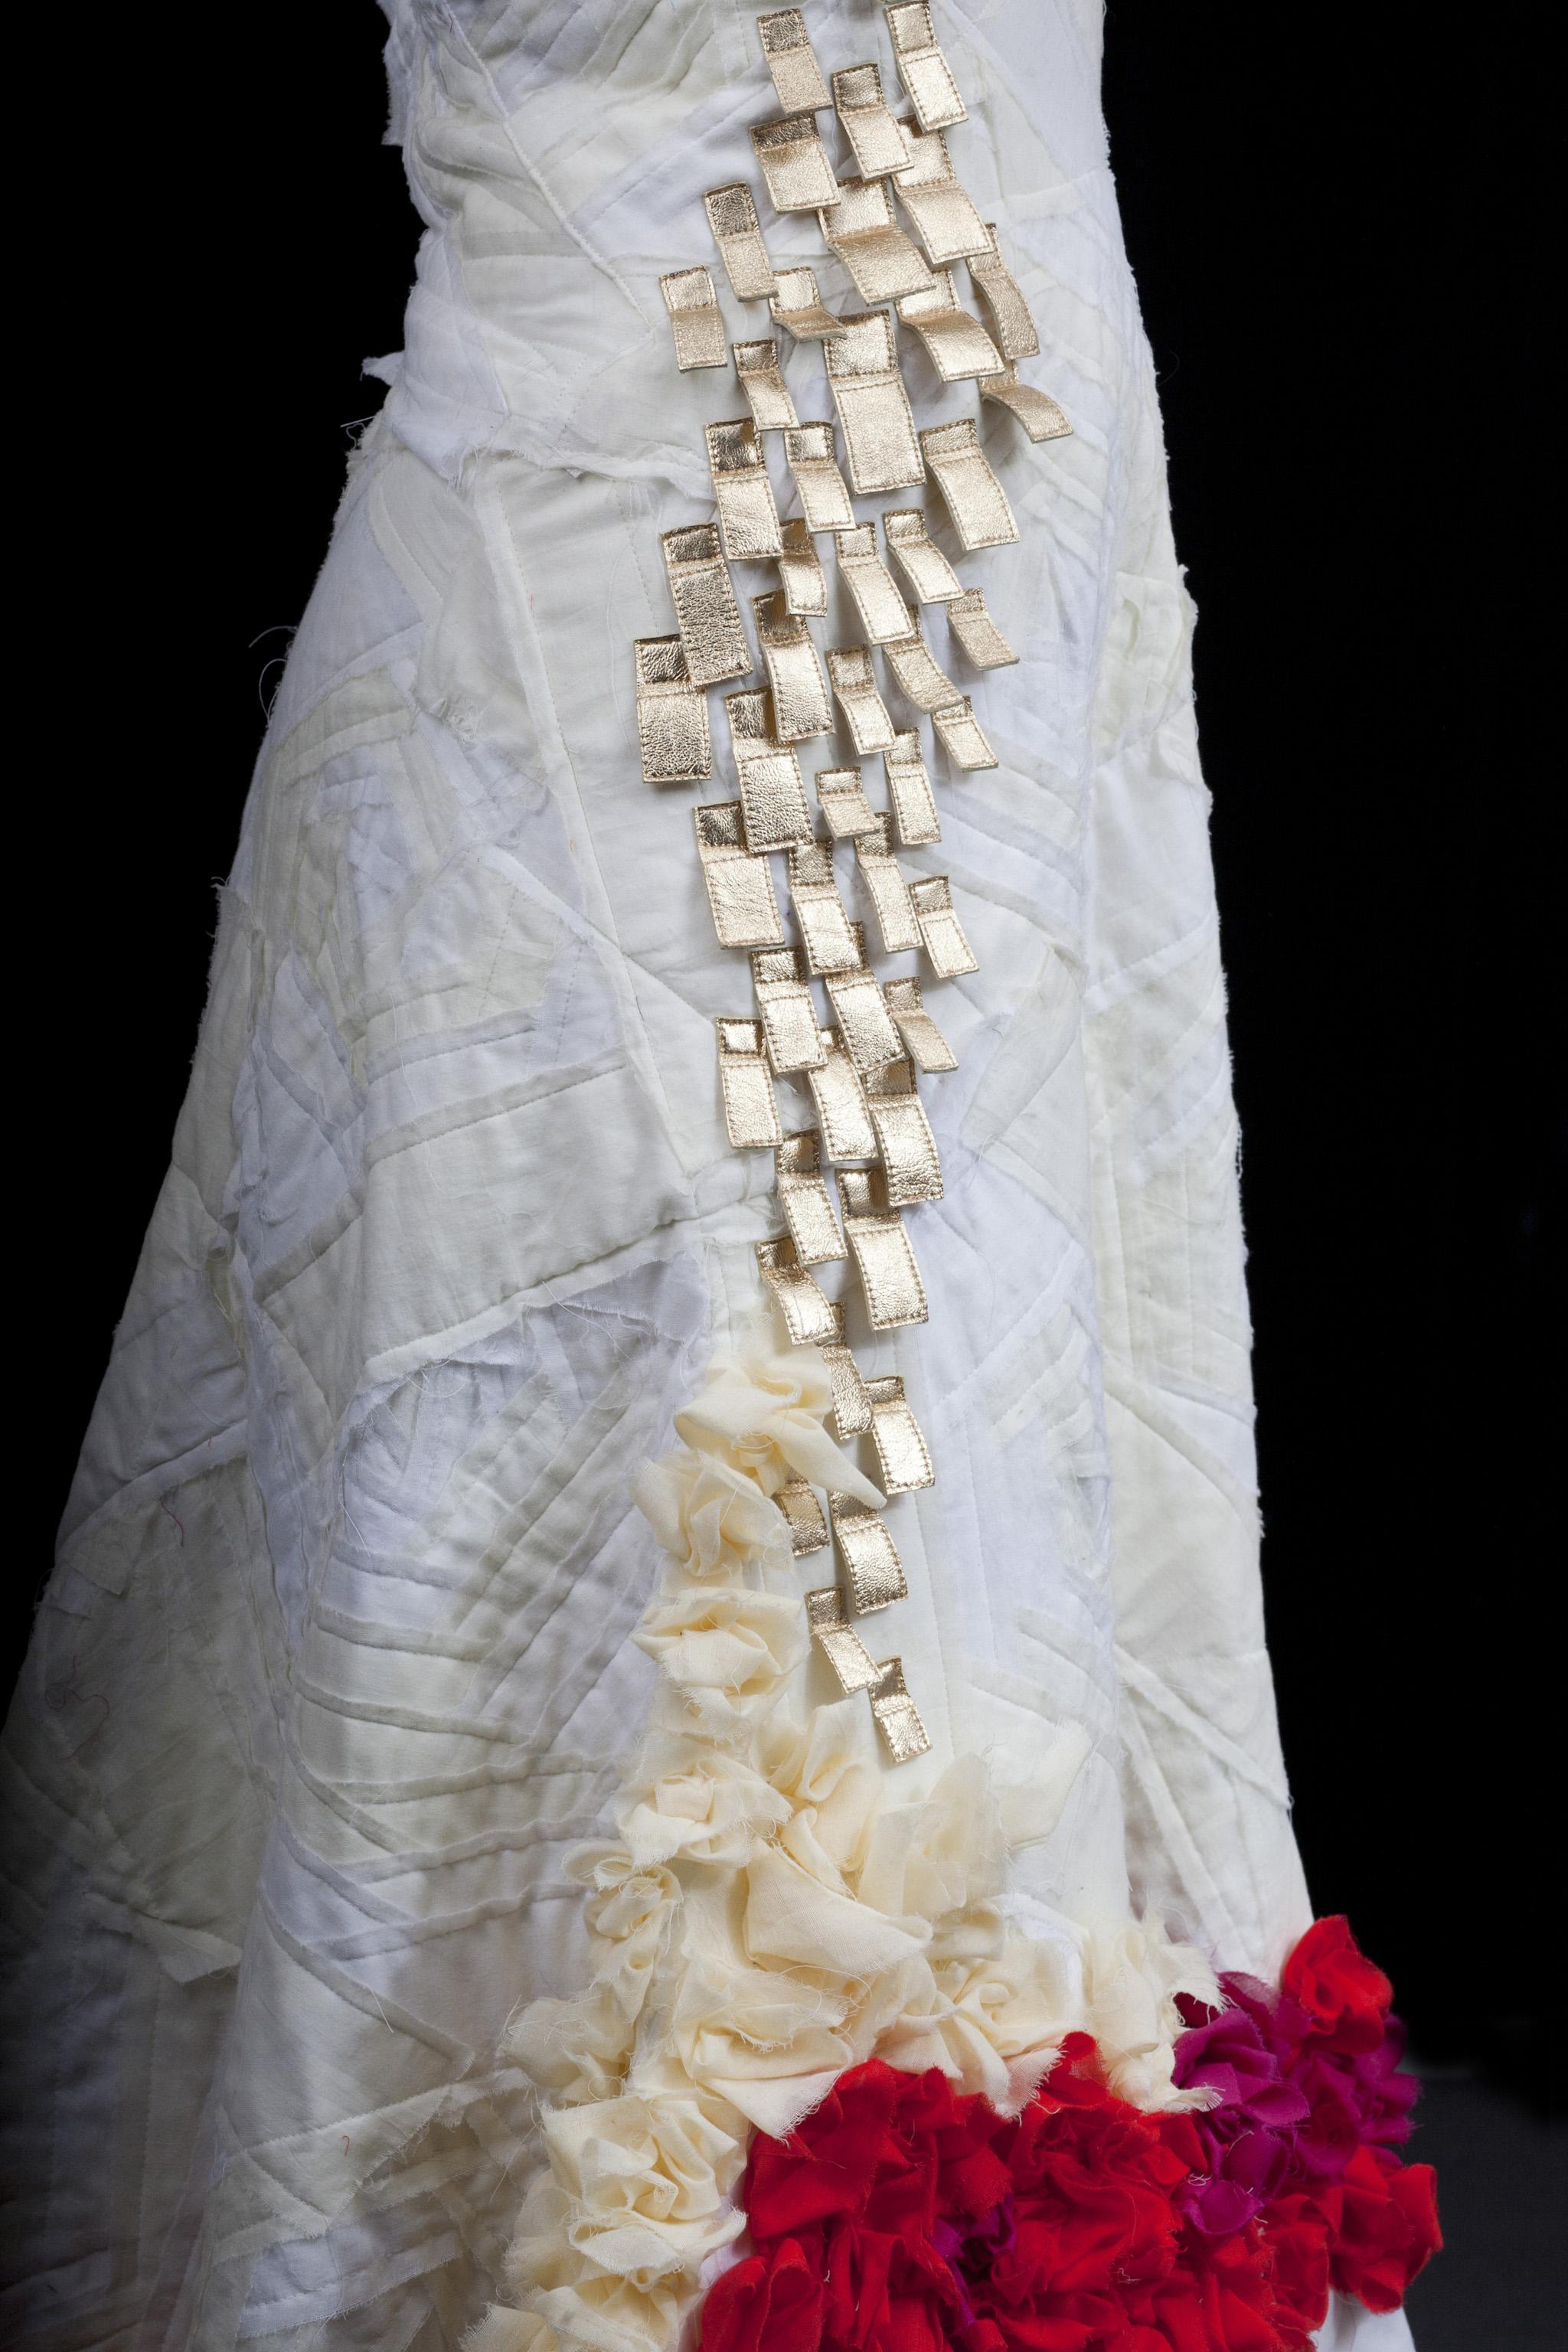 Mexican wedding dress, detail